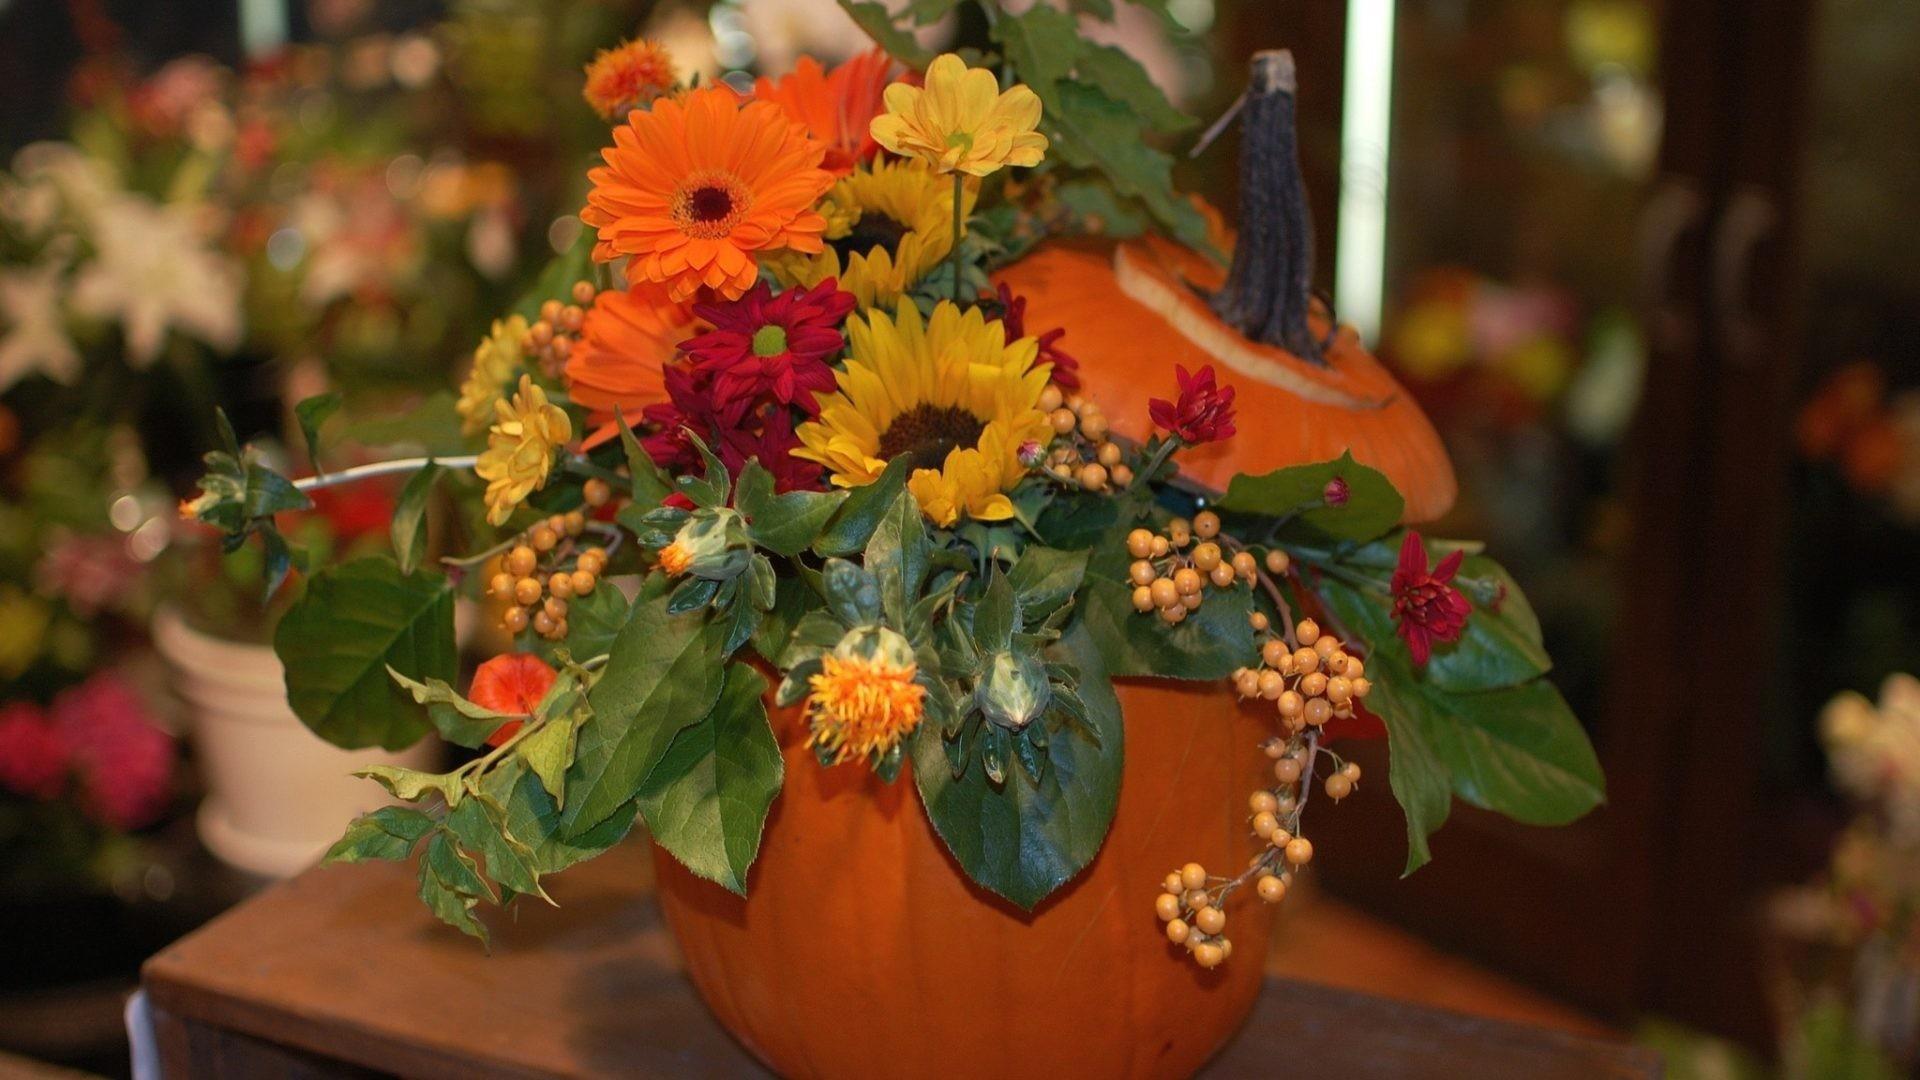 Pumpkin Tag – Bouquet Nature Bouquets Autumn Flowers Pumpkin Wallpaper Hd  for HD 16:9